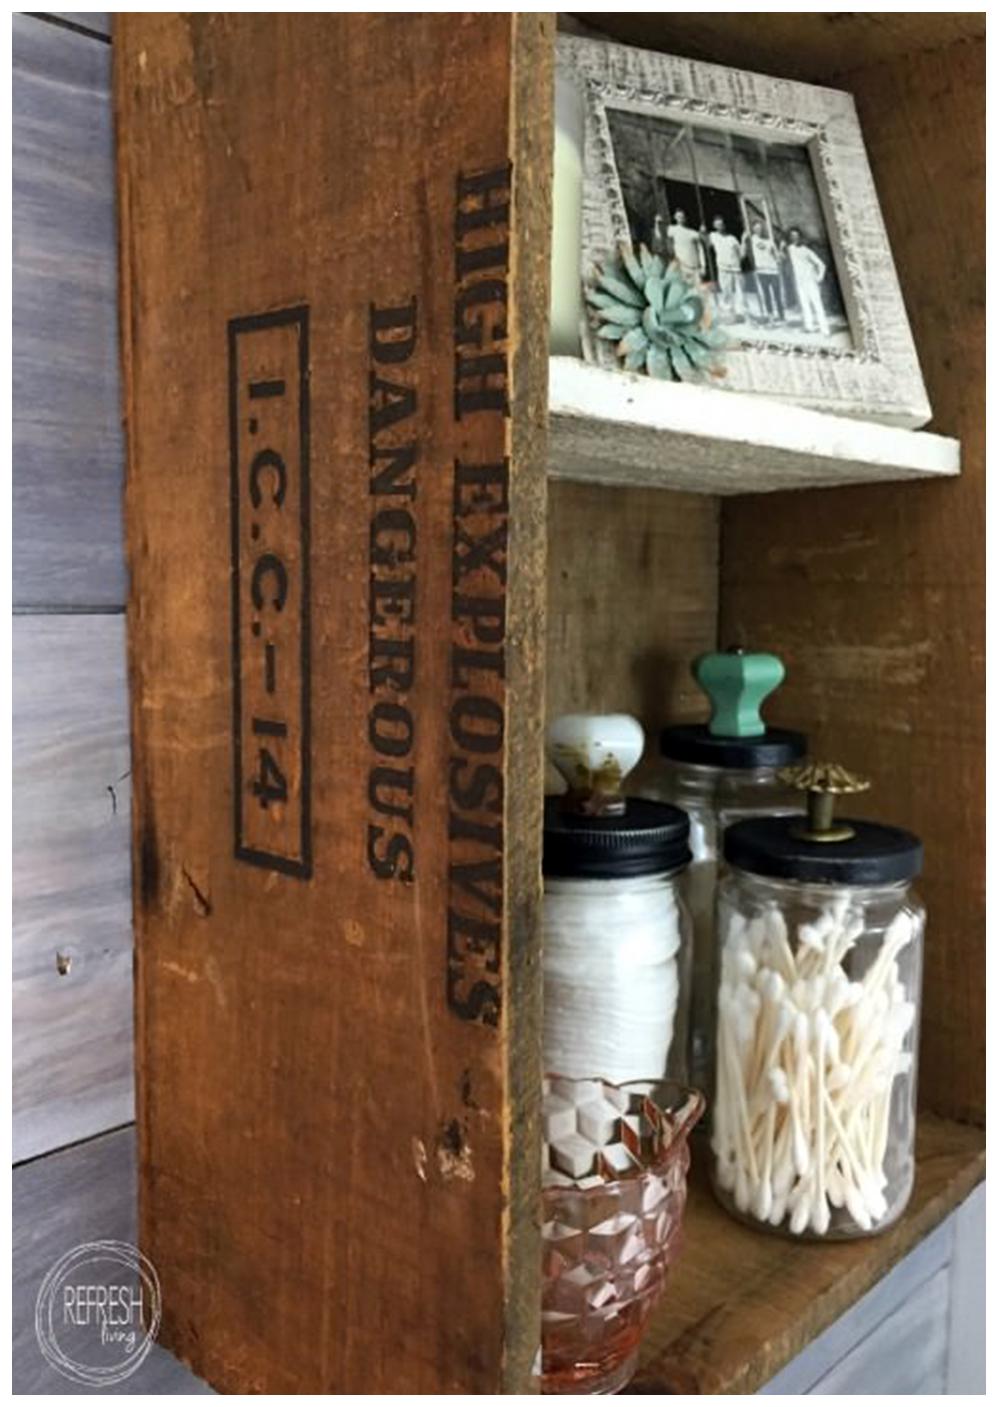 diy-bathroom-storage-rustic-550x733.jpg